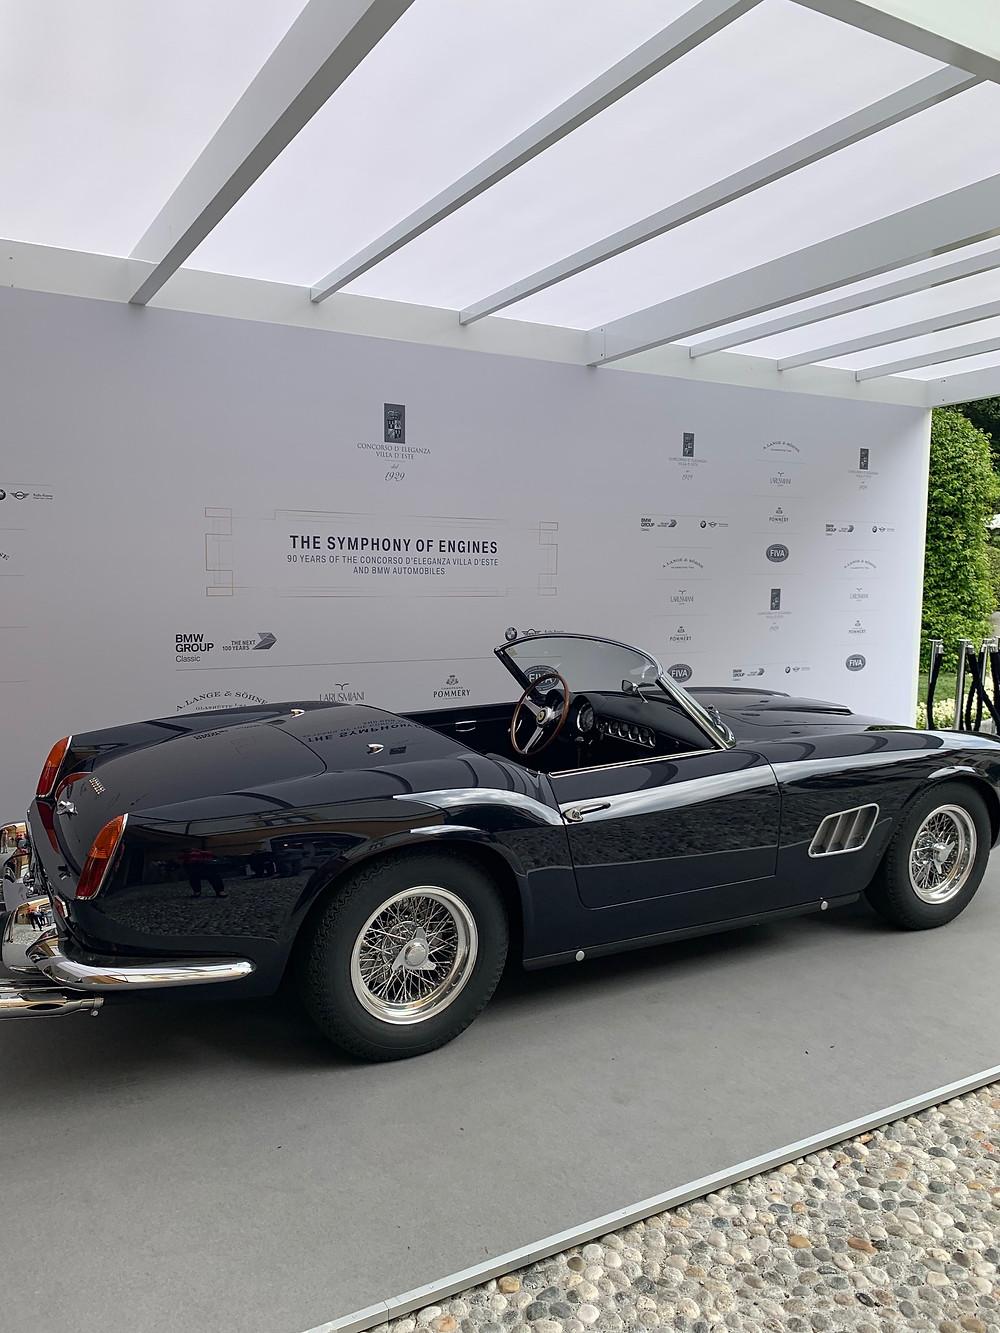 1961 Ferrari 250 GT California Spyder SWB, ex Alain Delon, ex Baillot